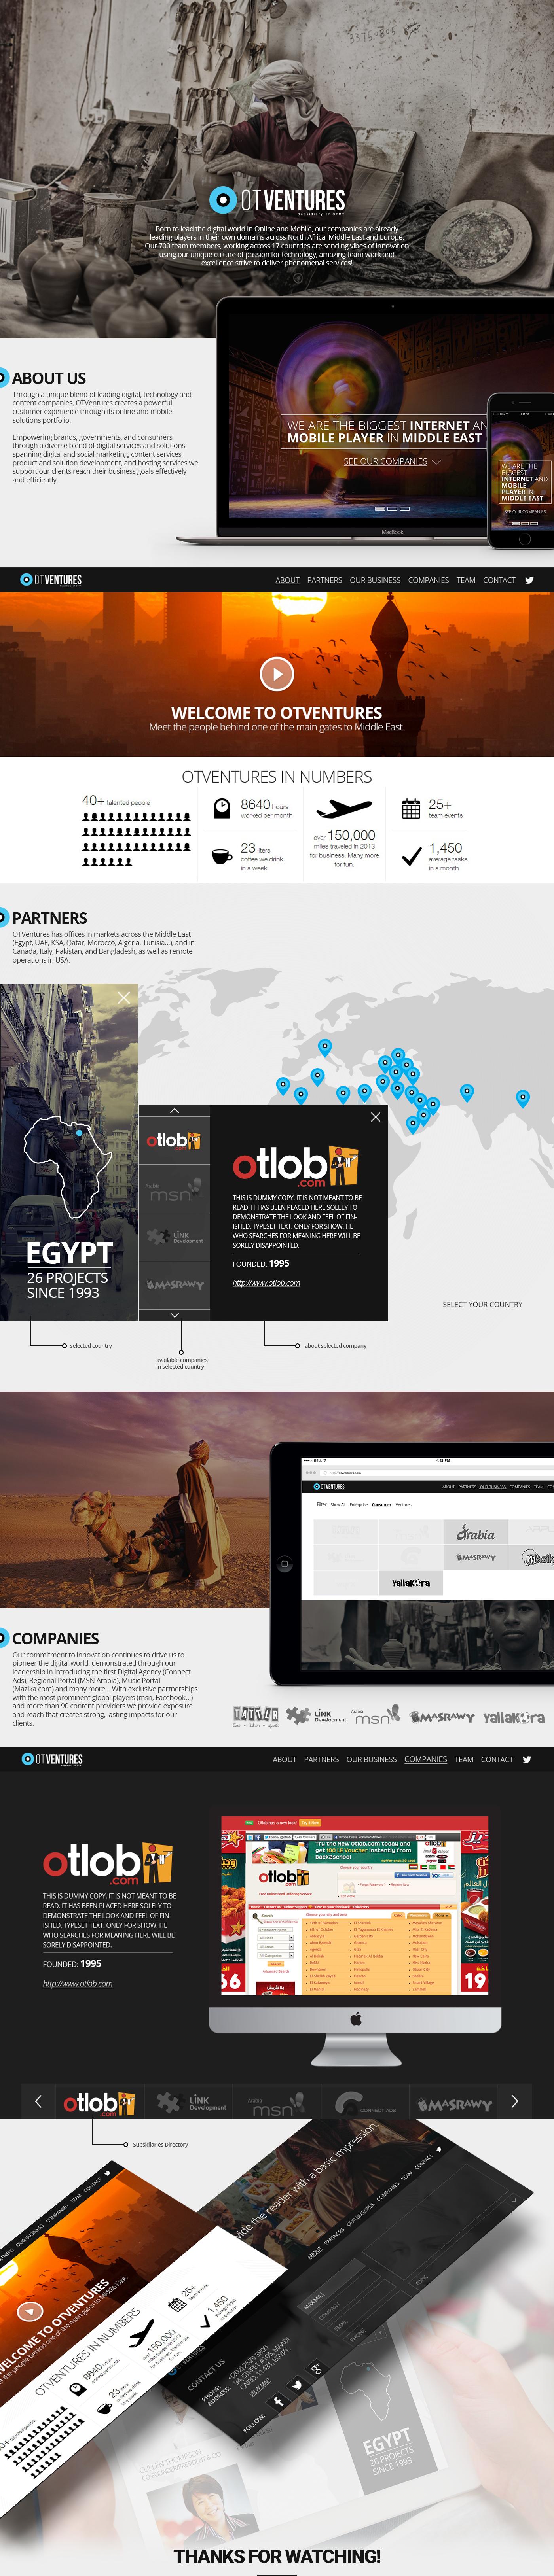 OTVentures egypt portal redesign revamp GUI ux portfolio orascom Otlob msn Masrawy mazzika Yallakora